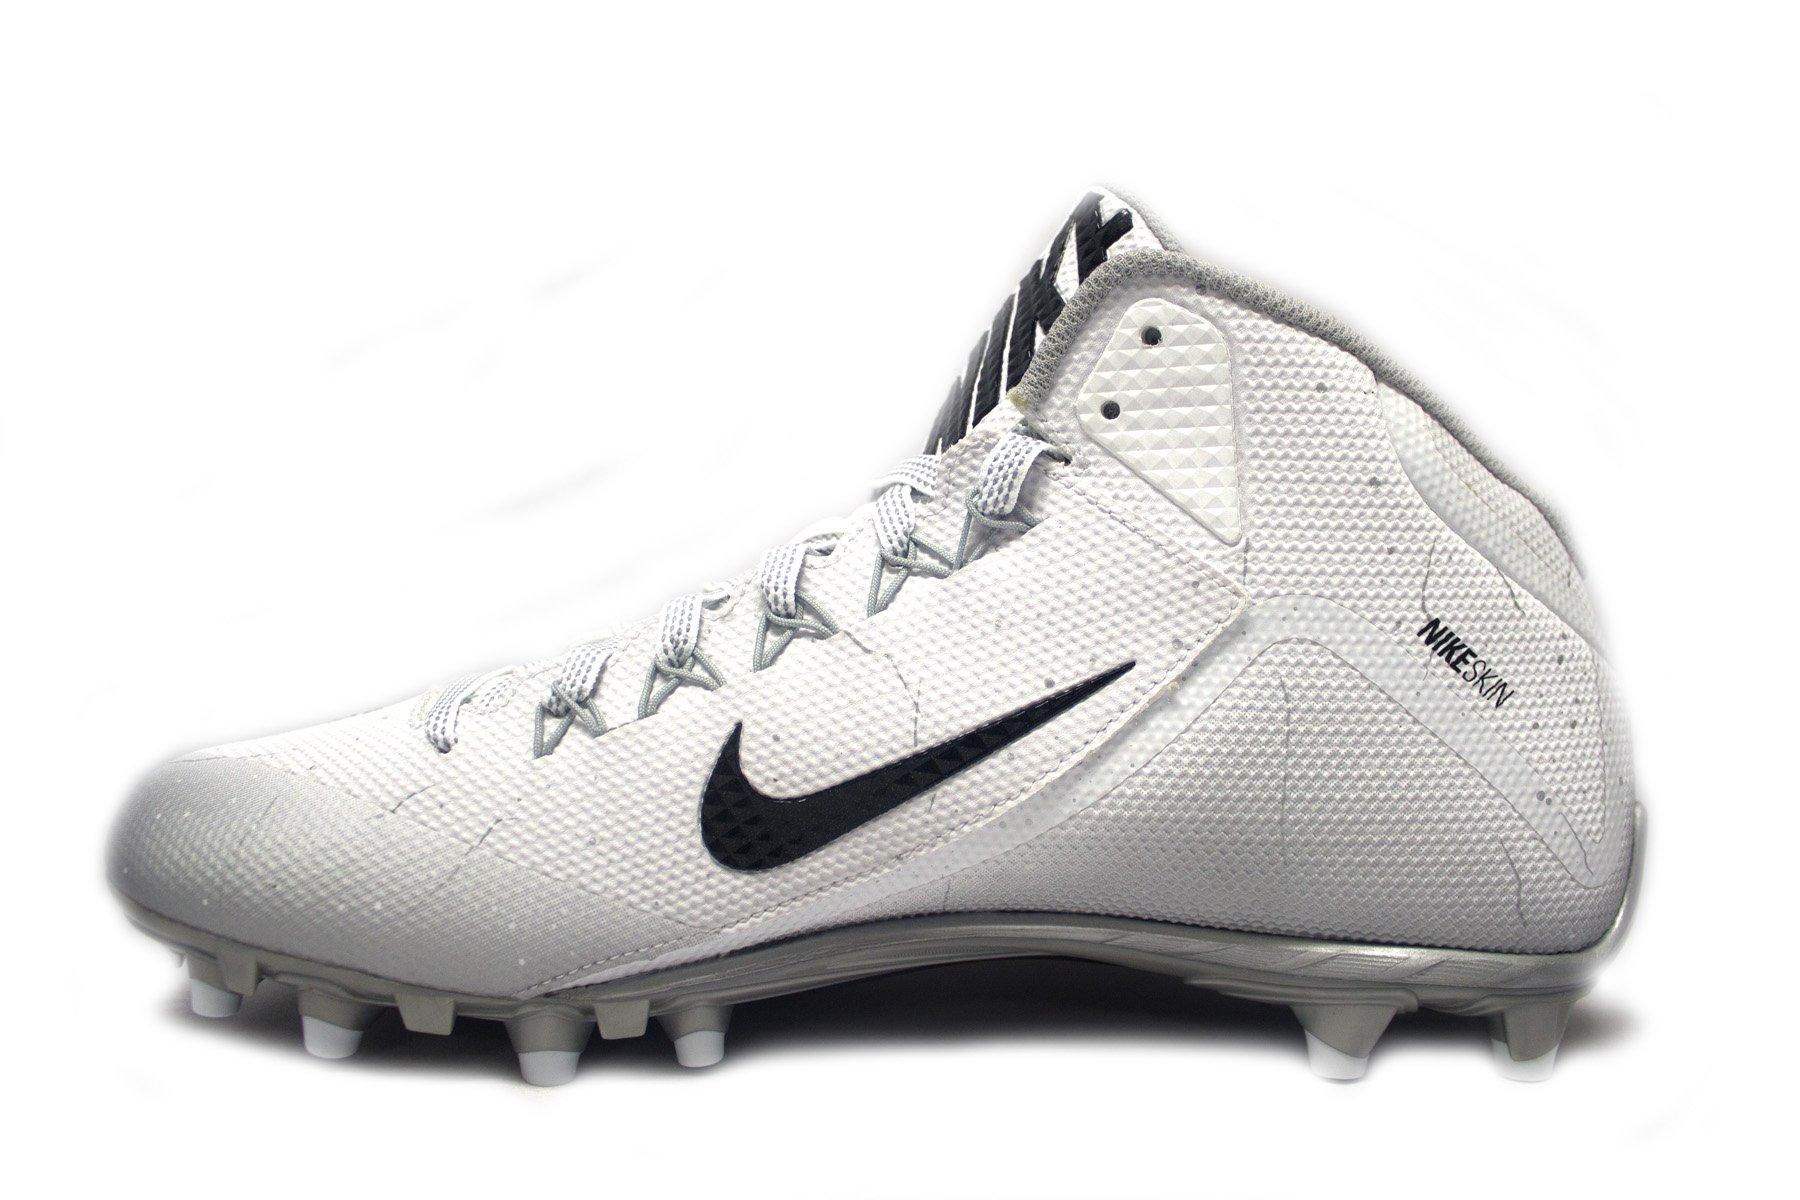 0396a9149b0c4 Galleon - Nike Alpha Pro 2 3/4 TD Football Cleats (15, White/Black)